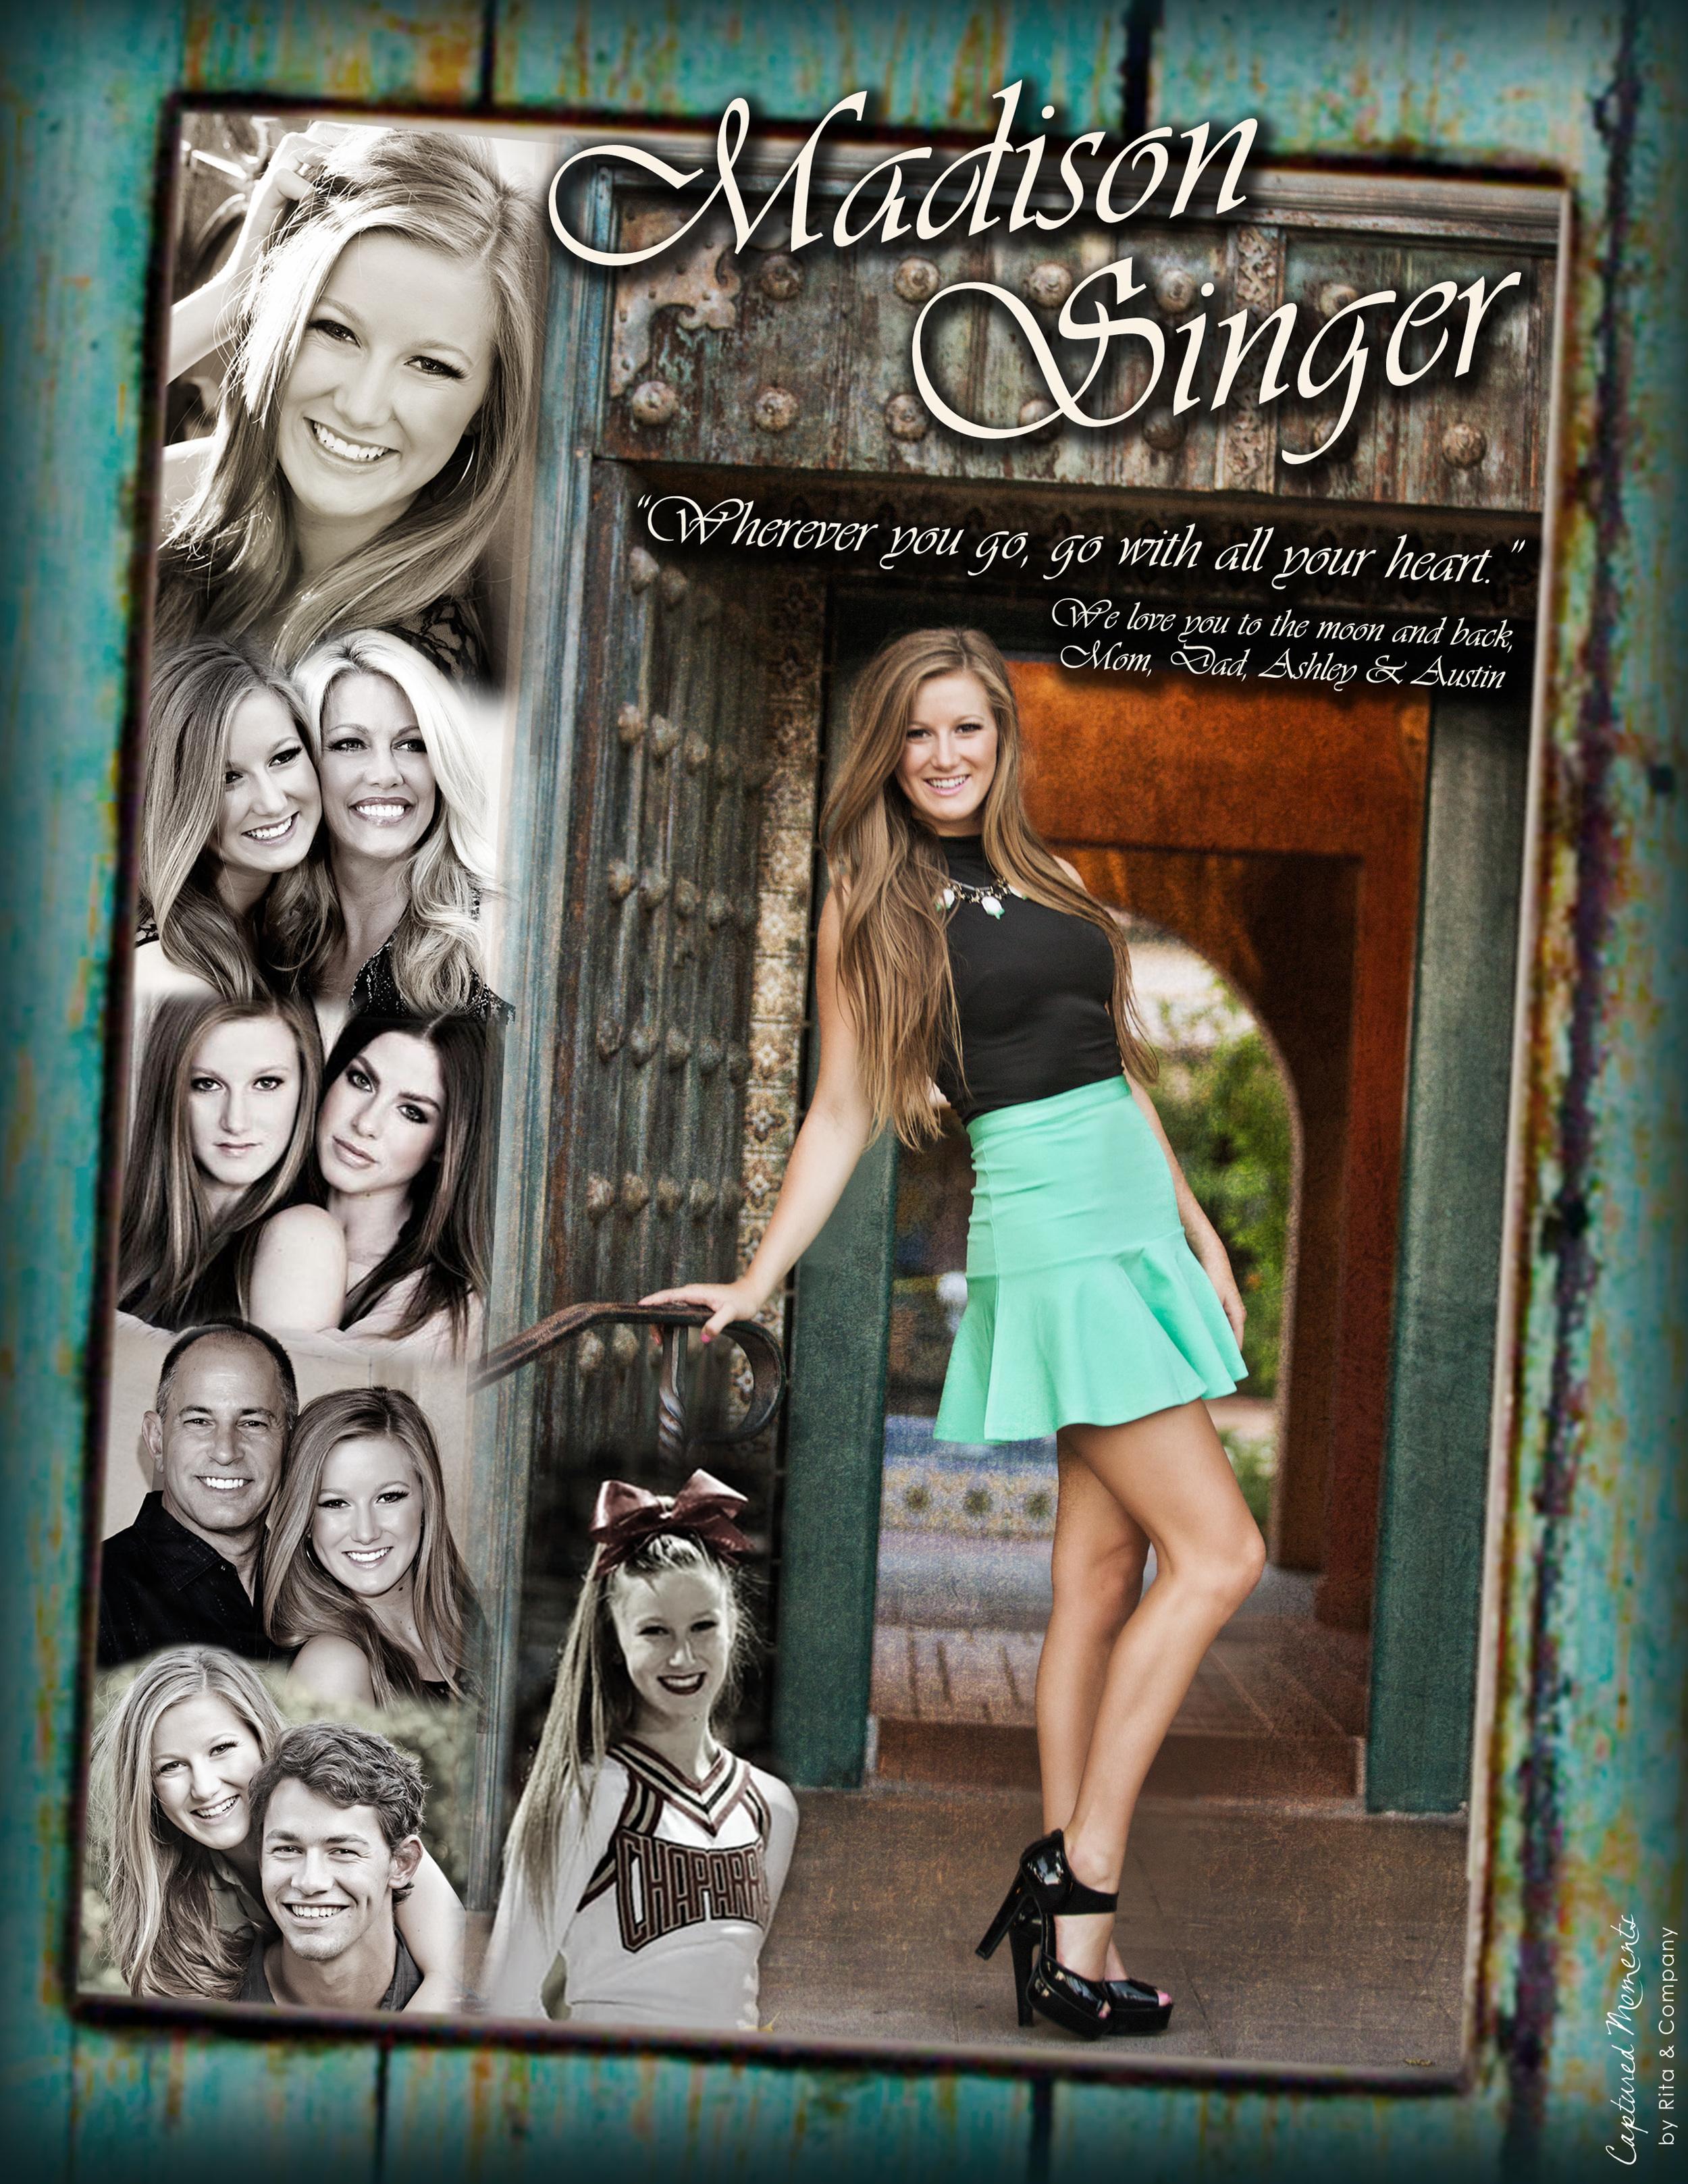 Madison Singer